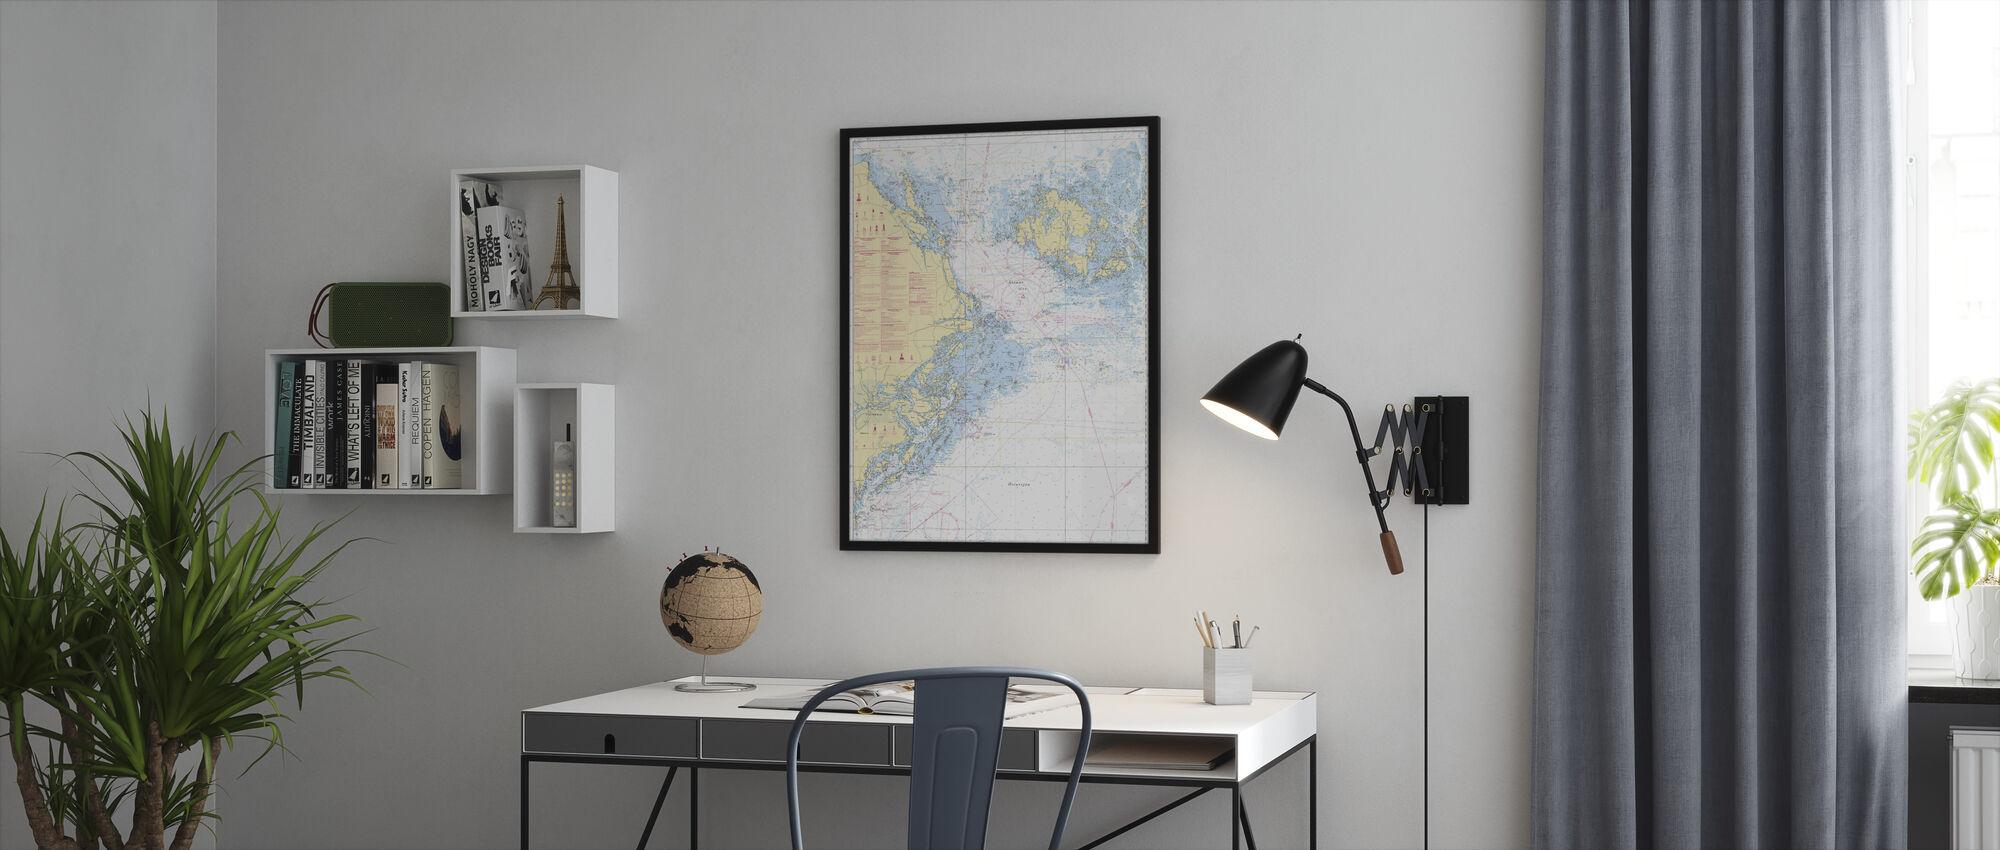 Sea Chart 61 - Landsort - Alands Hav - Framed print - Office